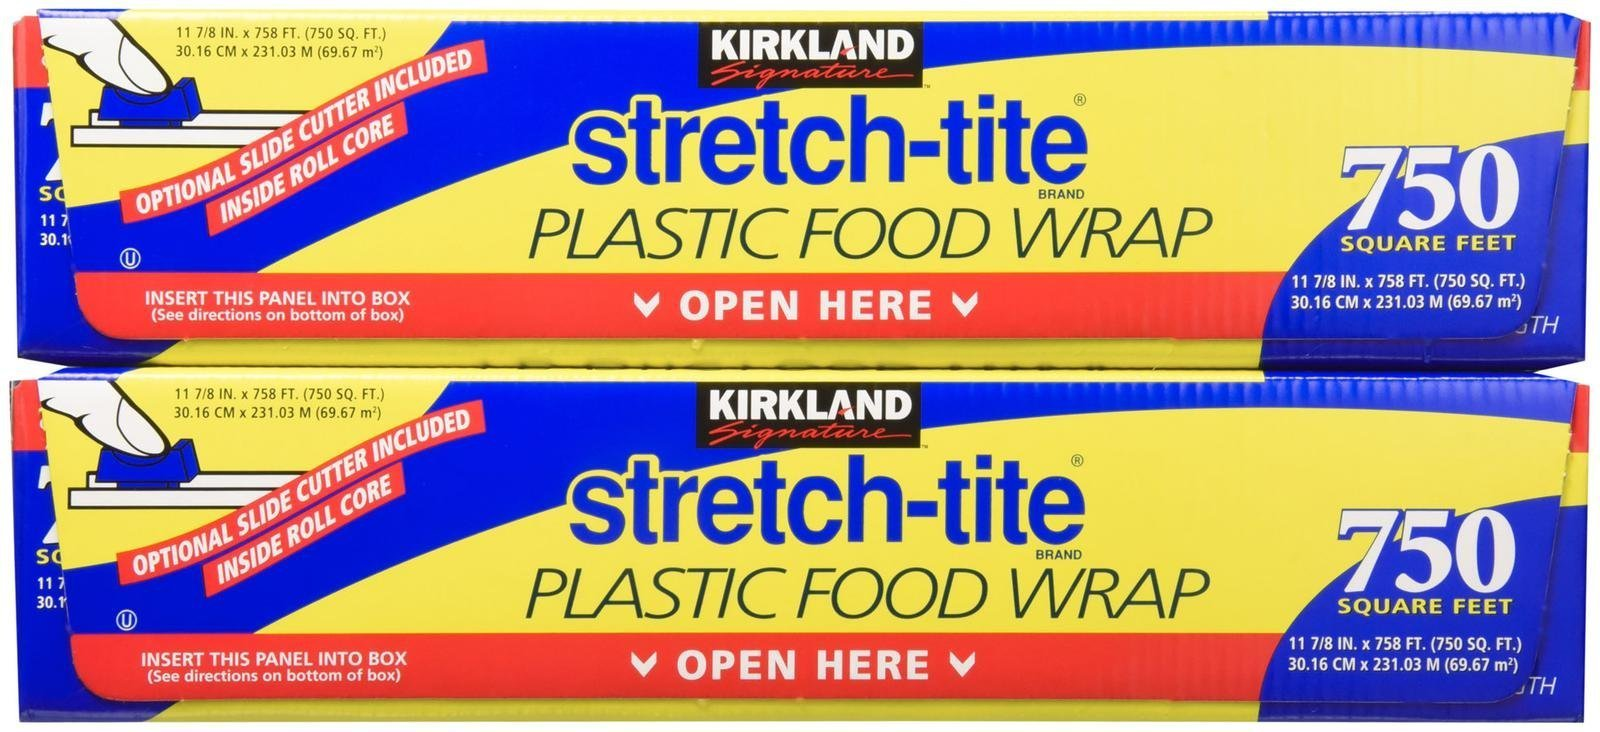 Kirkland Signature Stretch-Tite Plastic Wrap - 11 7/8 x750 feet - 2 pk by Kirkland Signature